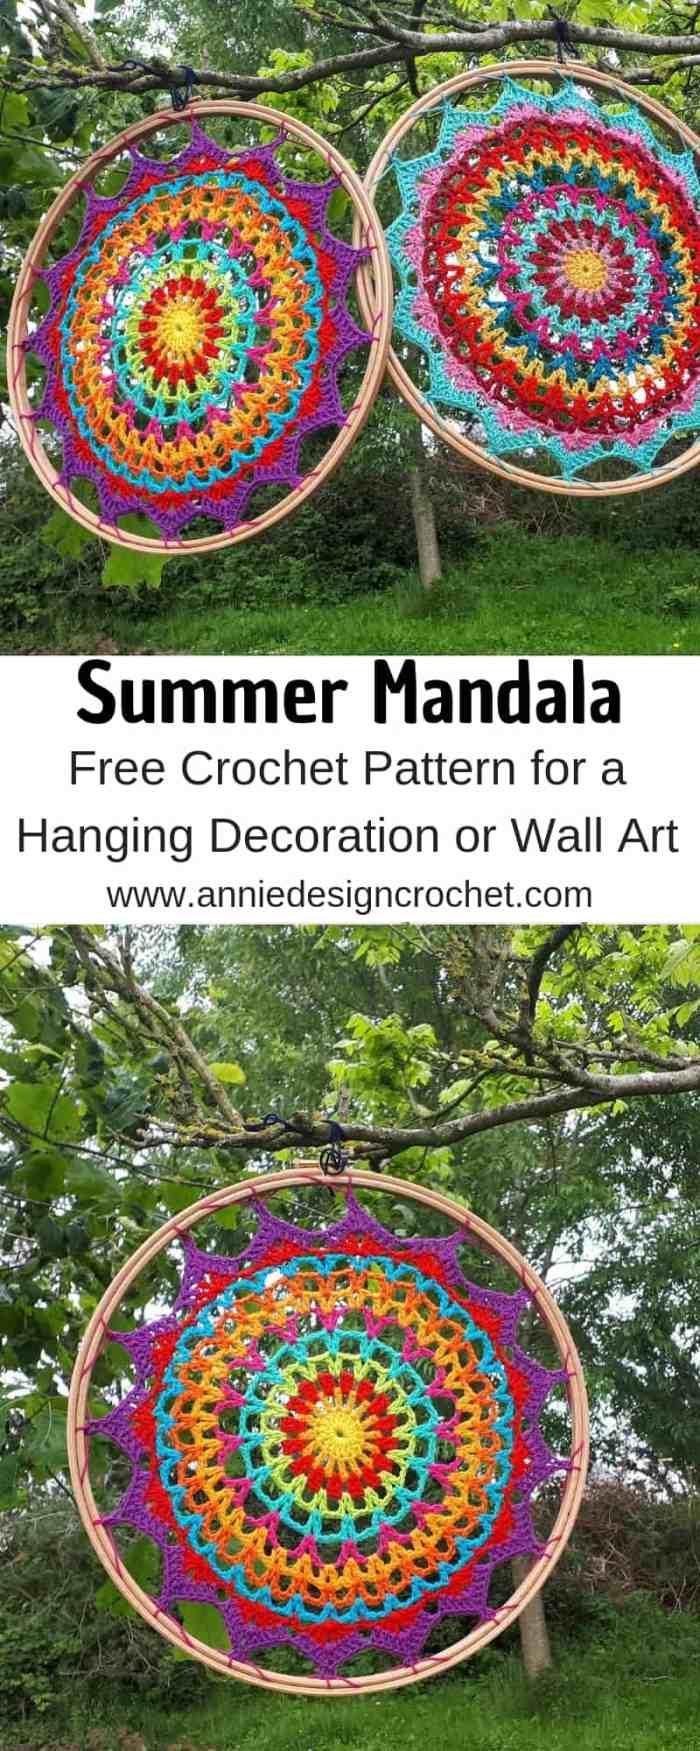 crochet mandala free pattern dream catcher wall art